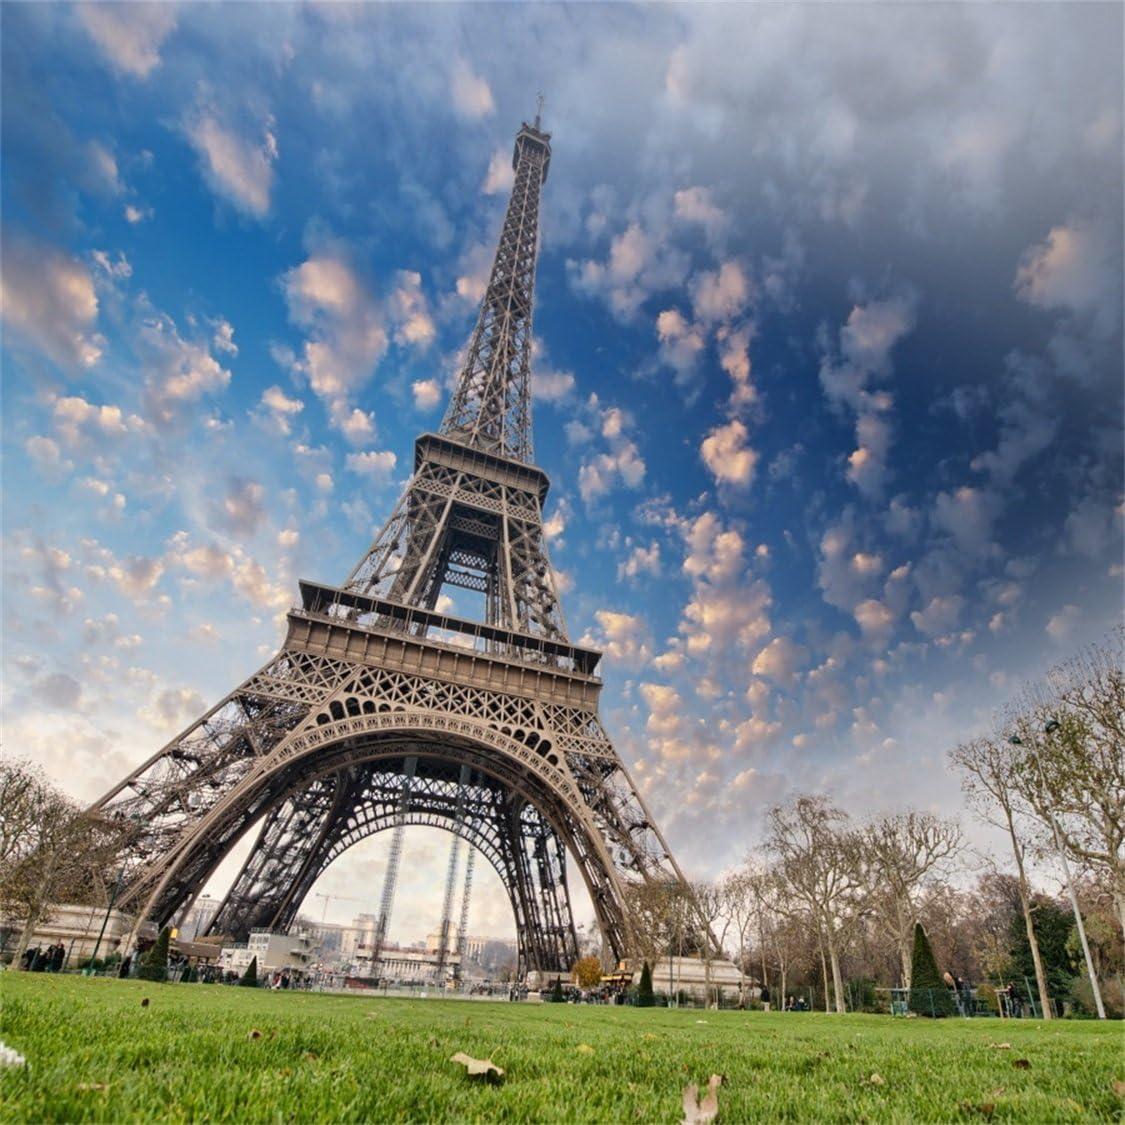 5x7ft Ooozkken Eiffel Tower Background Theme Newborn Indoor Photography Studio Photography